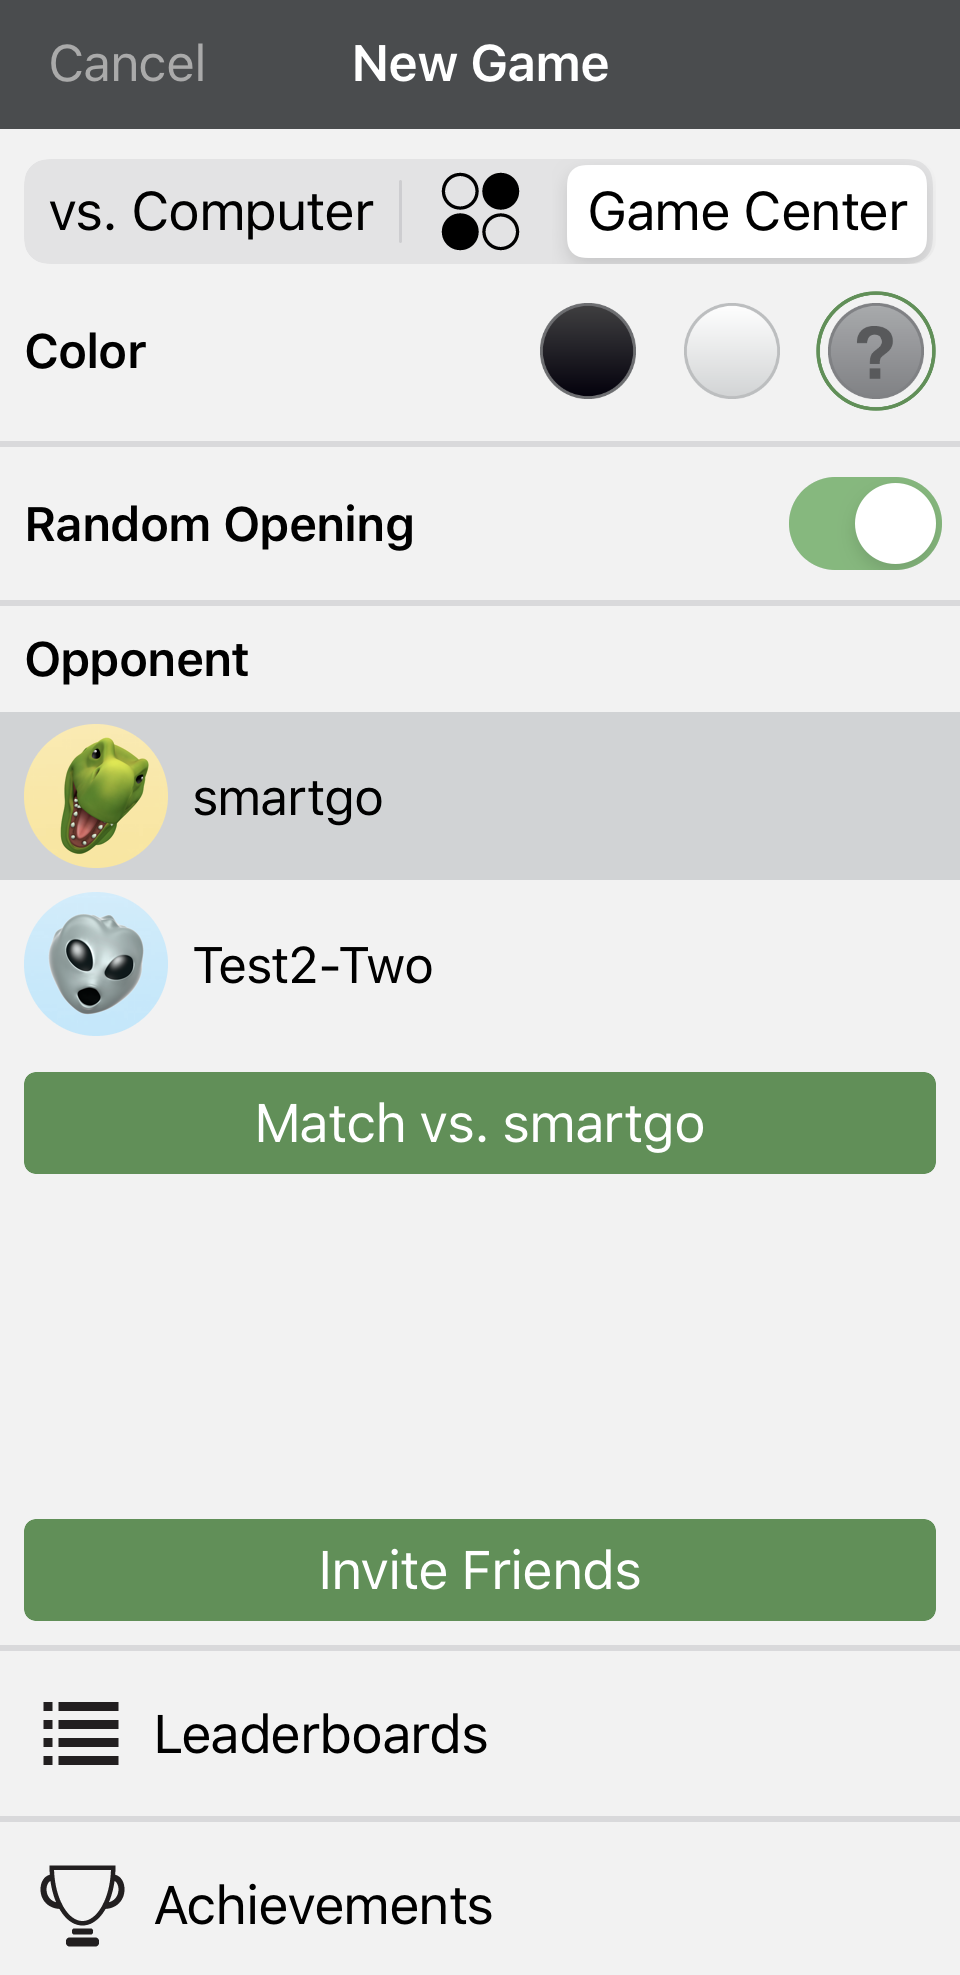 start-game-center-game